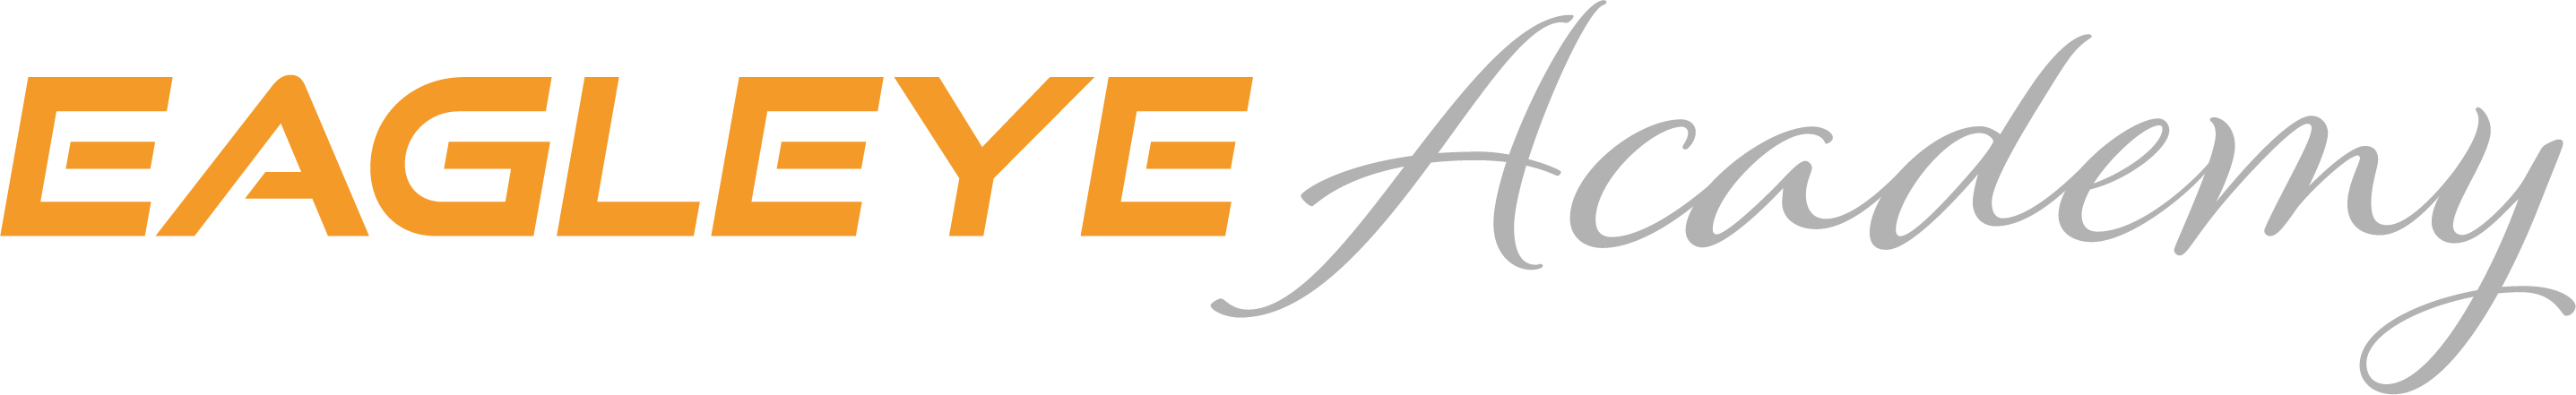 Bilder Eagleye Academy GmbH